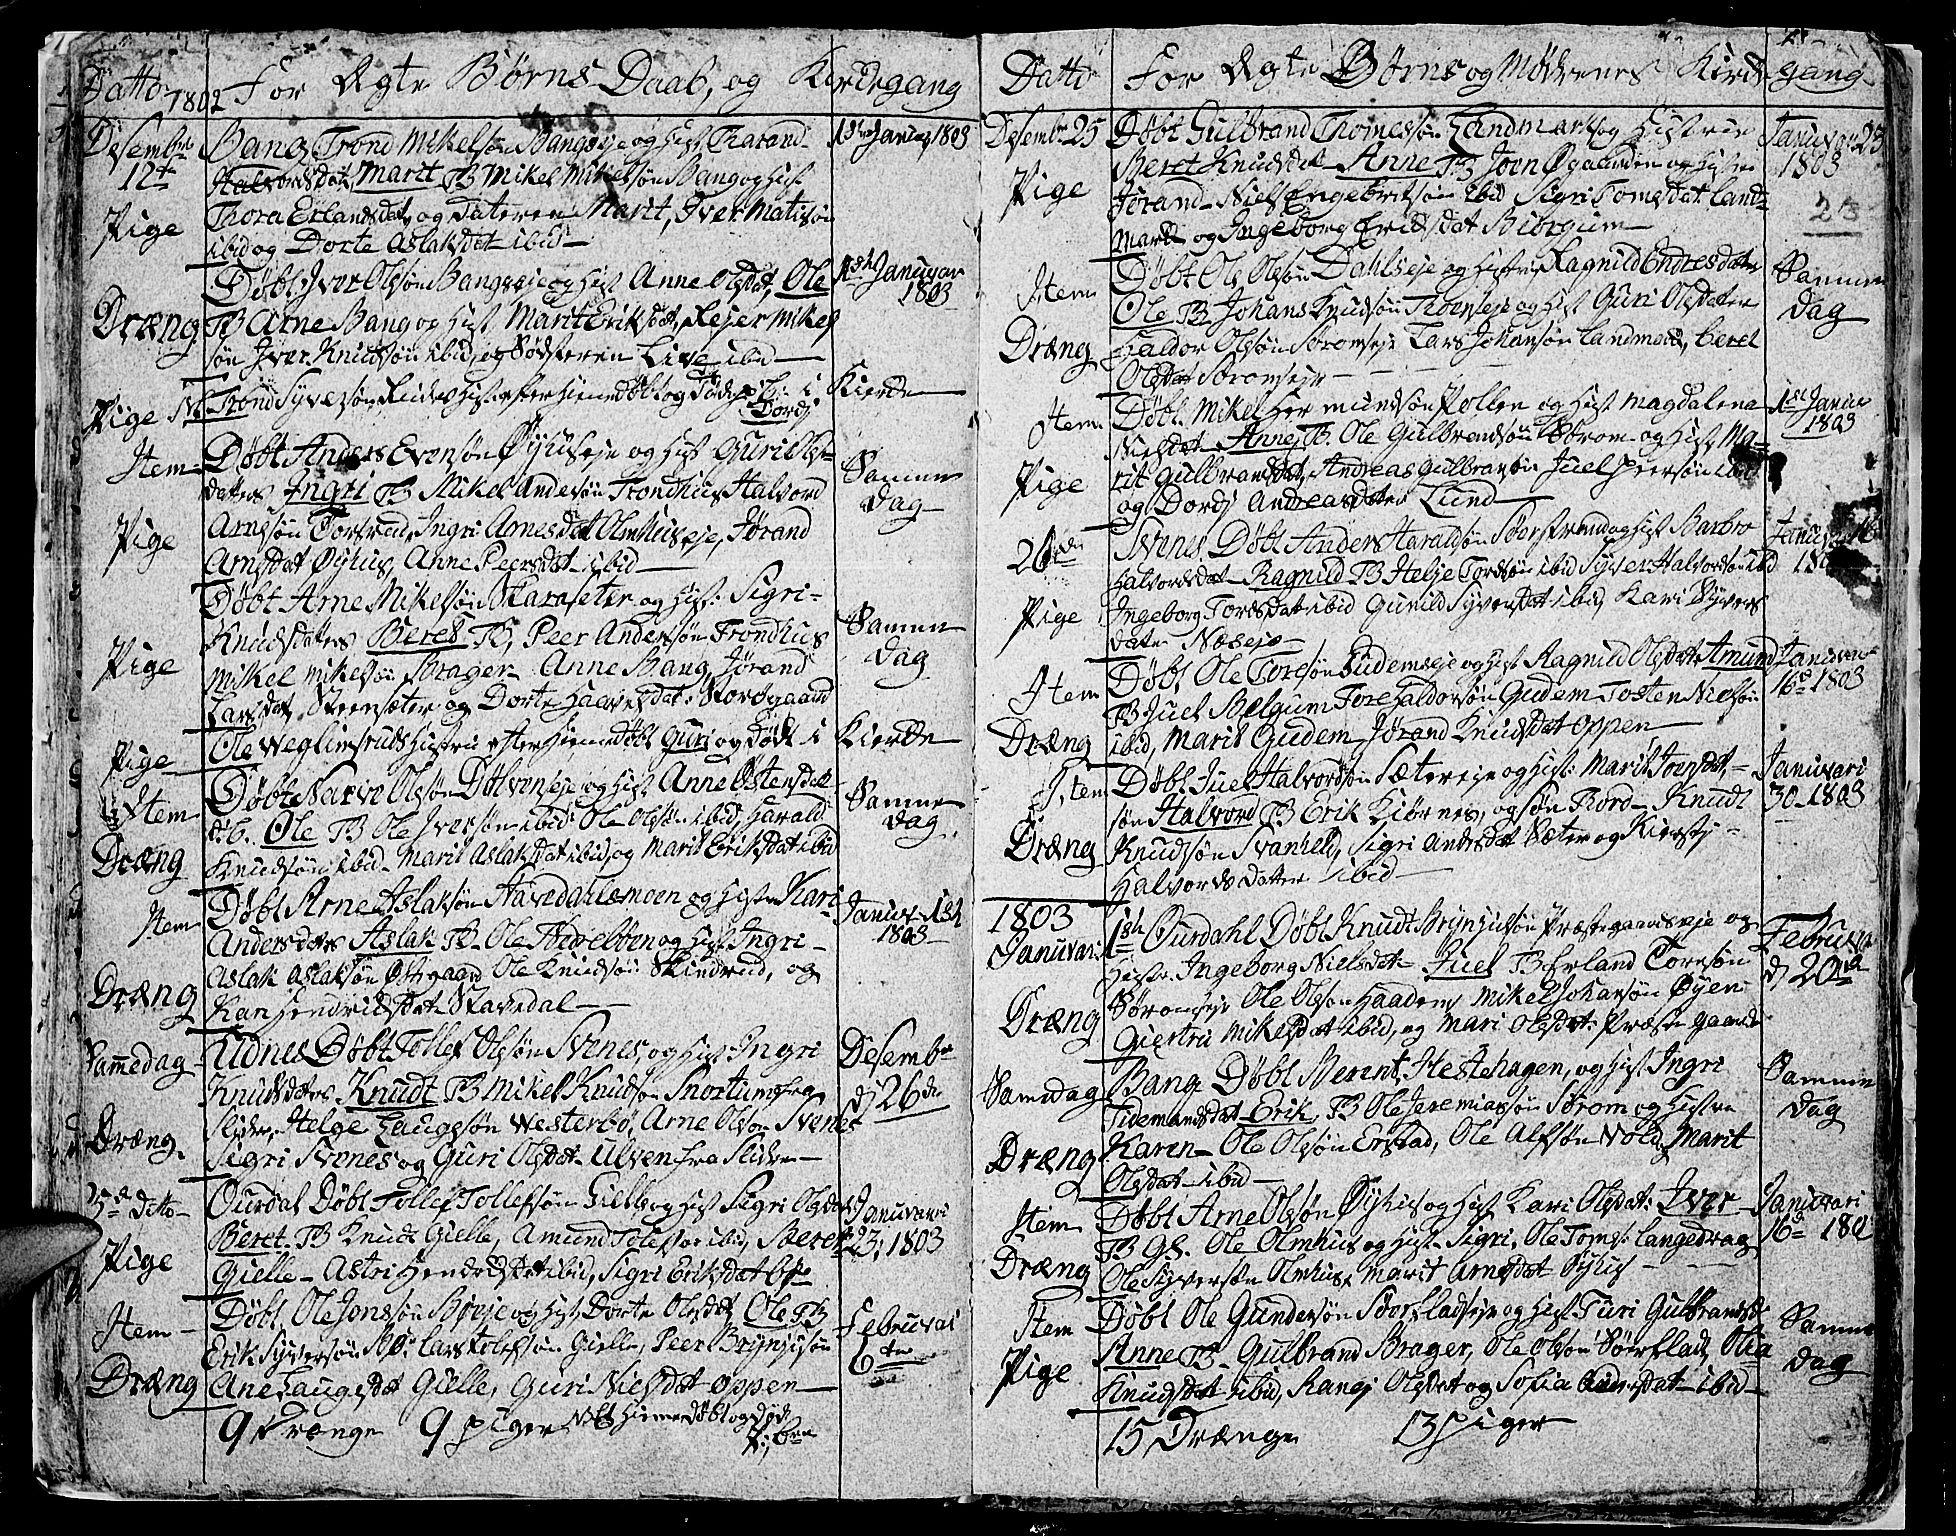 SAH, Aurdal prestekontor, Ministerialbok nr. 7, 1800-1808, s. 23